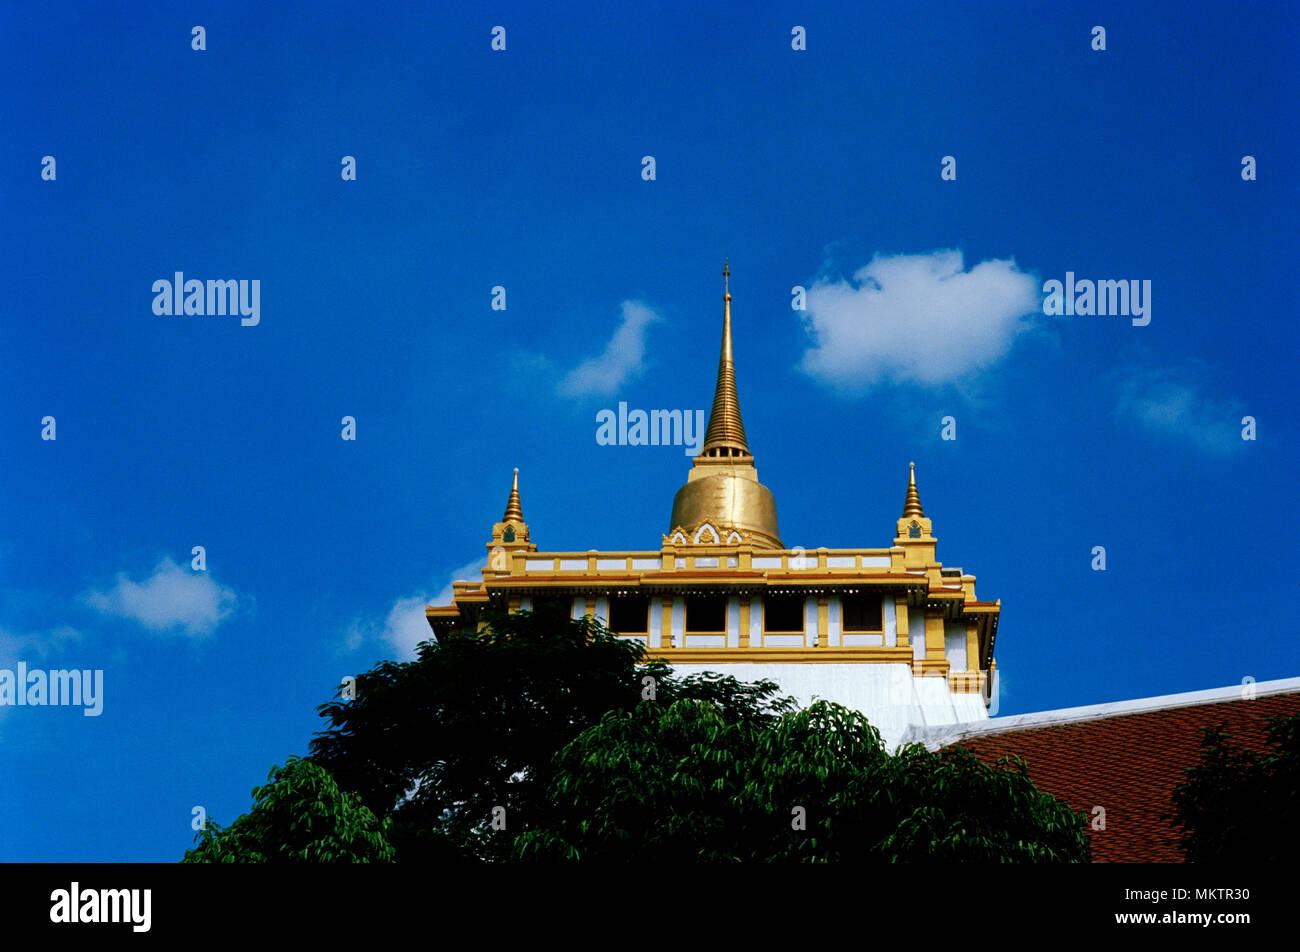 Golden Mount - Buddhist shrine of Wat Saket Ratcha Wora Maha Wihan Golden Mountain Temple in Bangkok in Thailand in Southeast Asia Far East. Sky Stock Photo